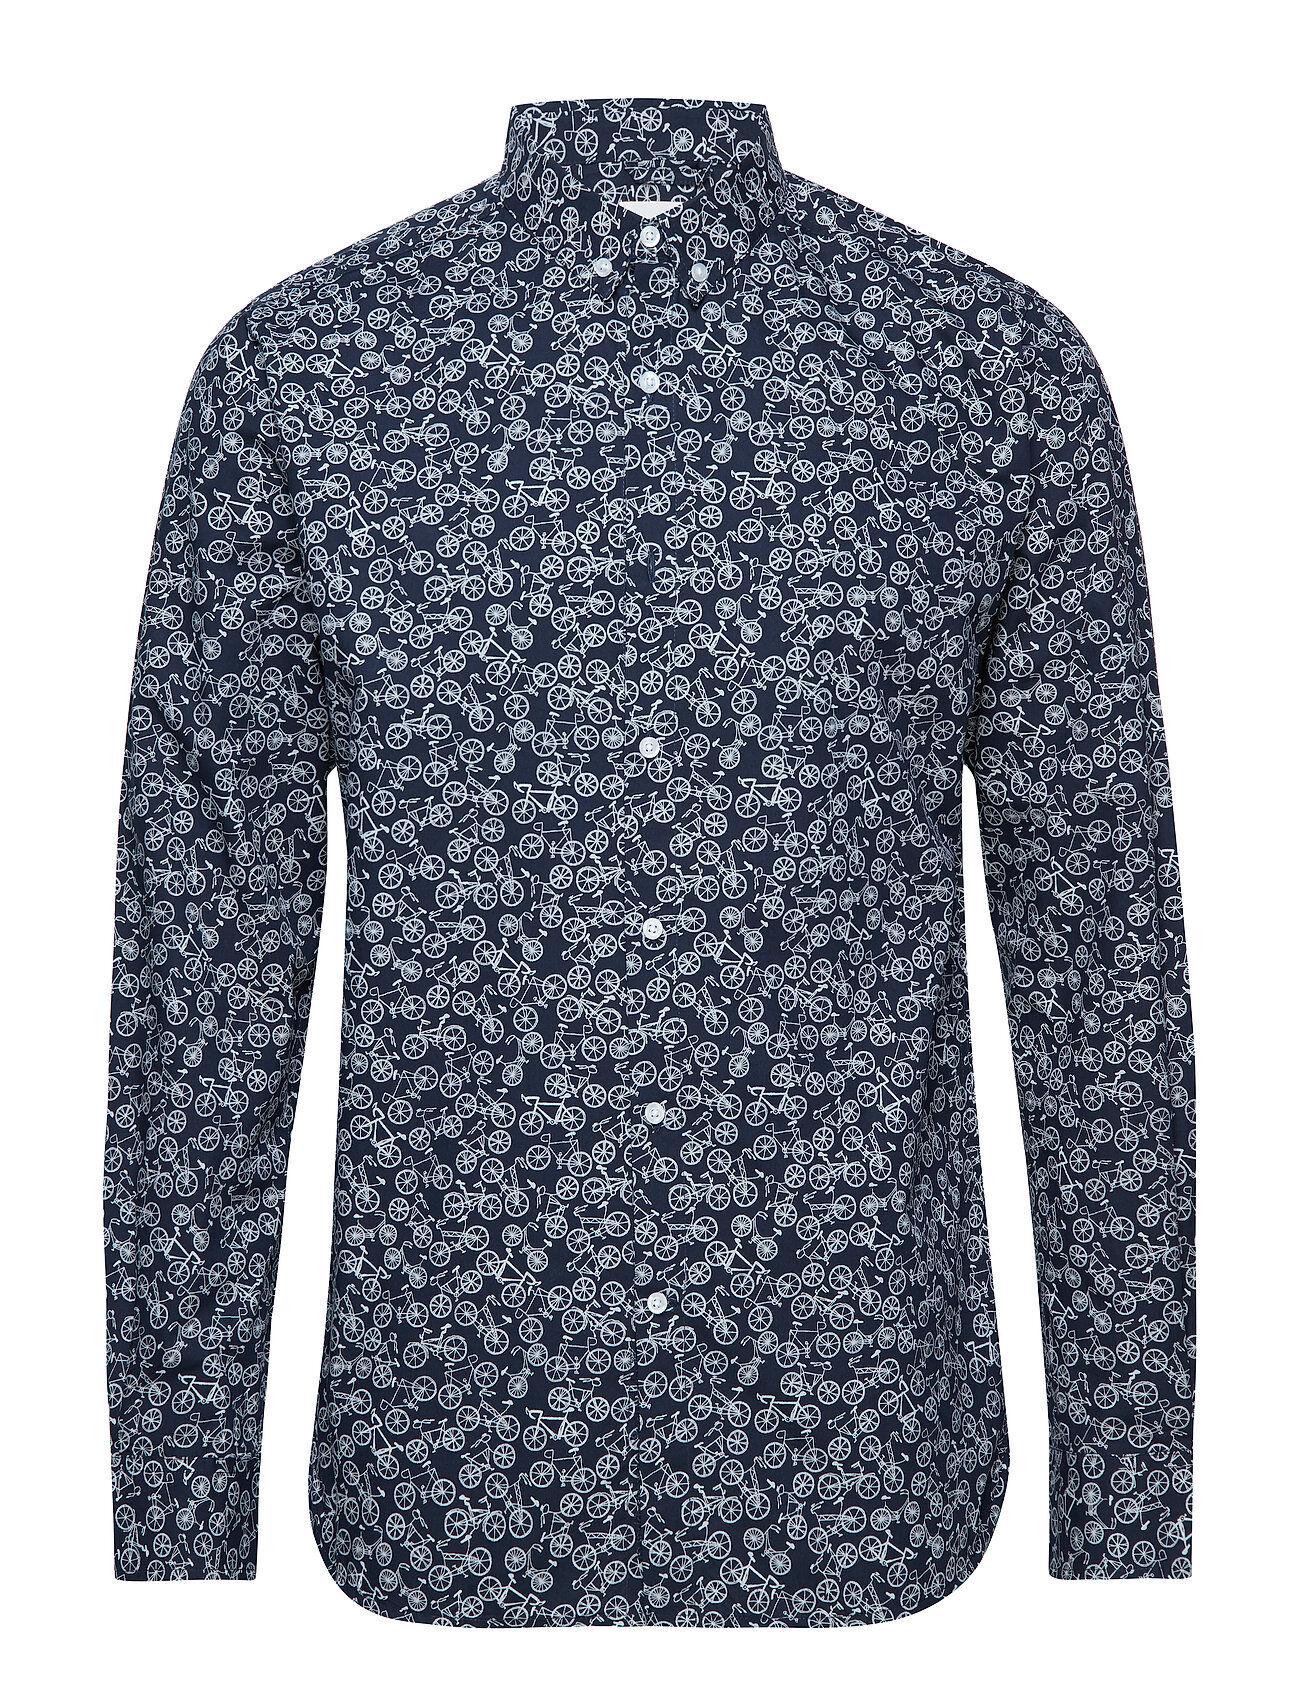 Knowledge Cotton Apparel Poplin Shirt With Bike Print - Gots